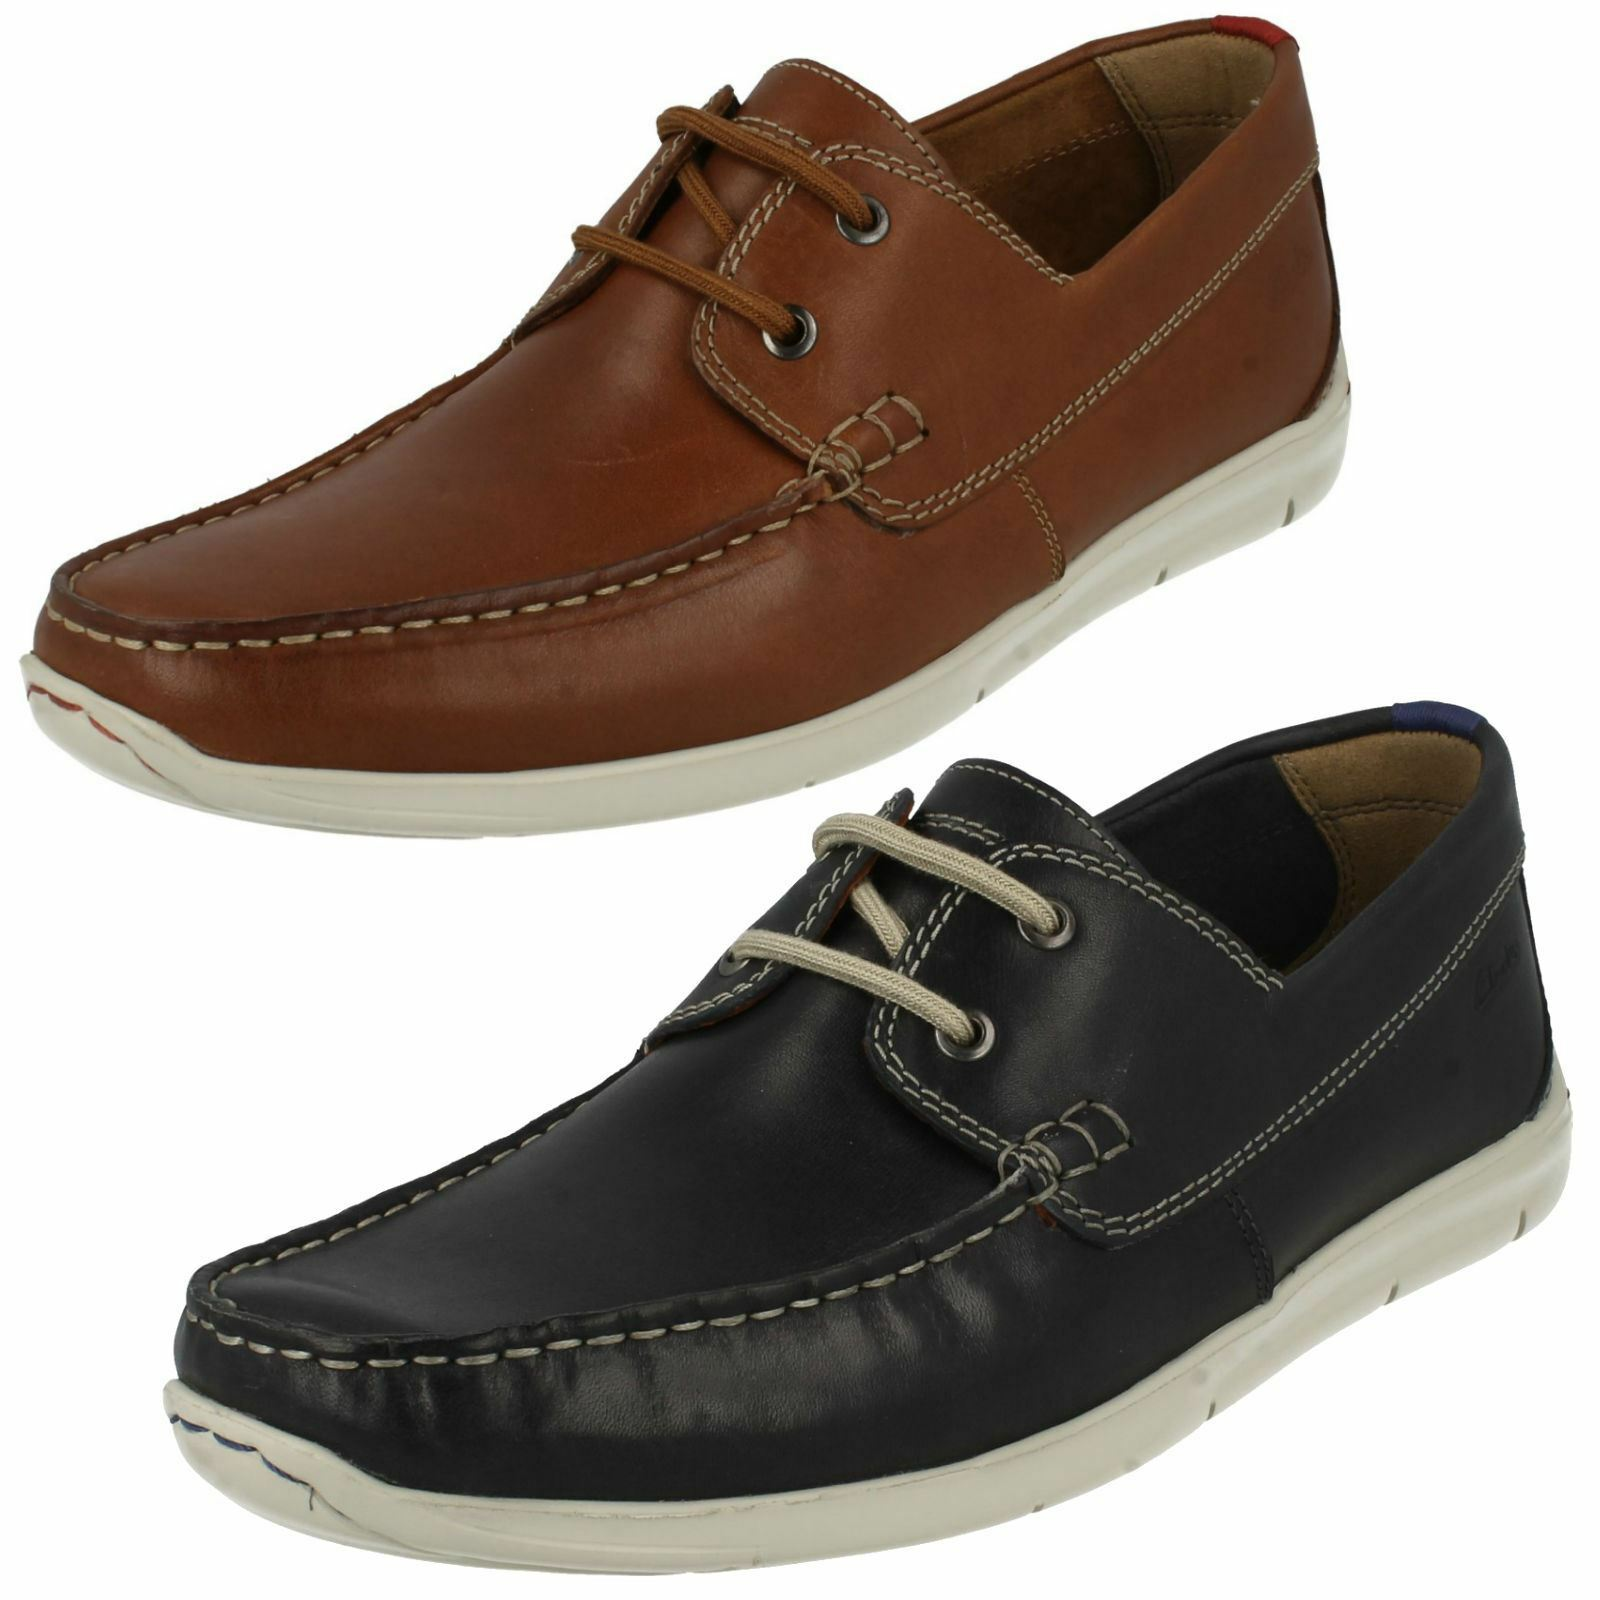 Herren Clarks  Karlock Step Casual Schuhes